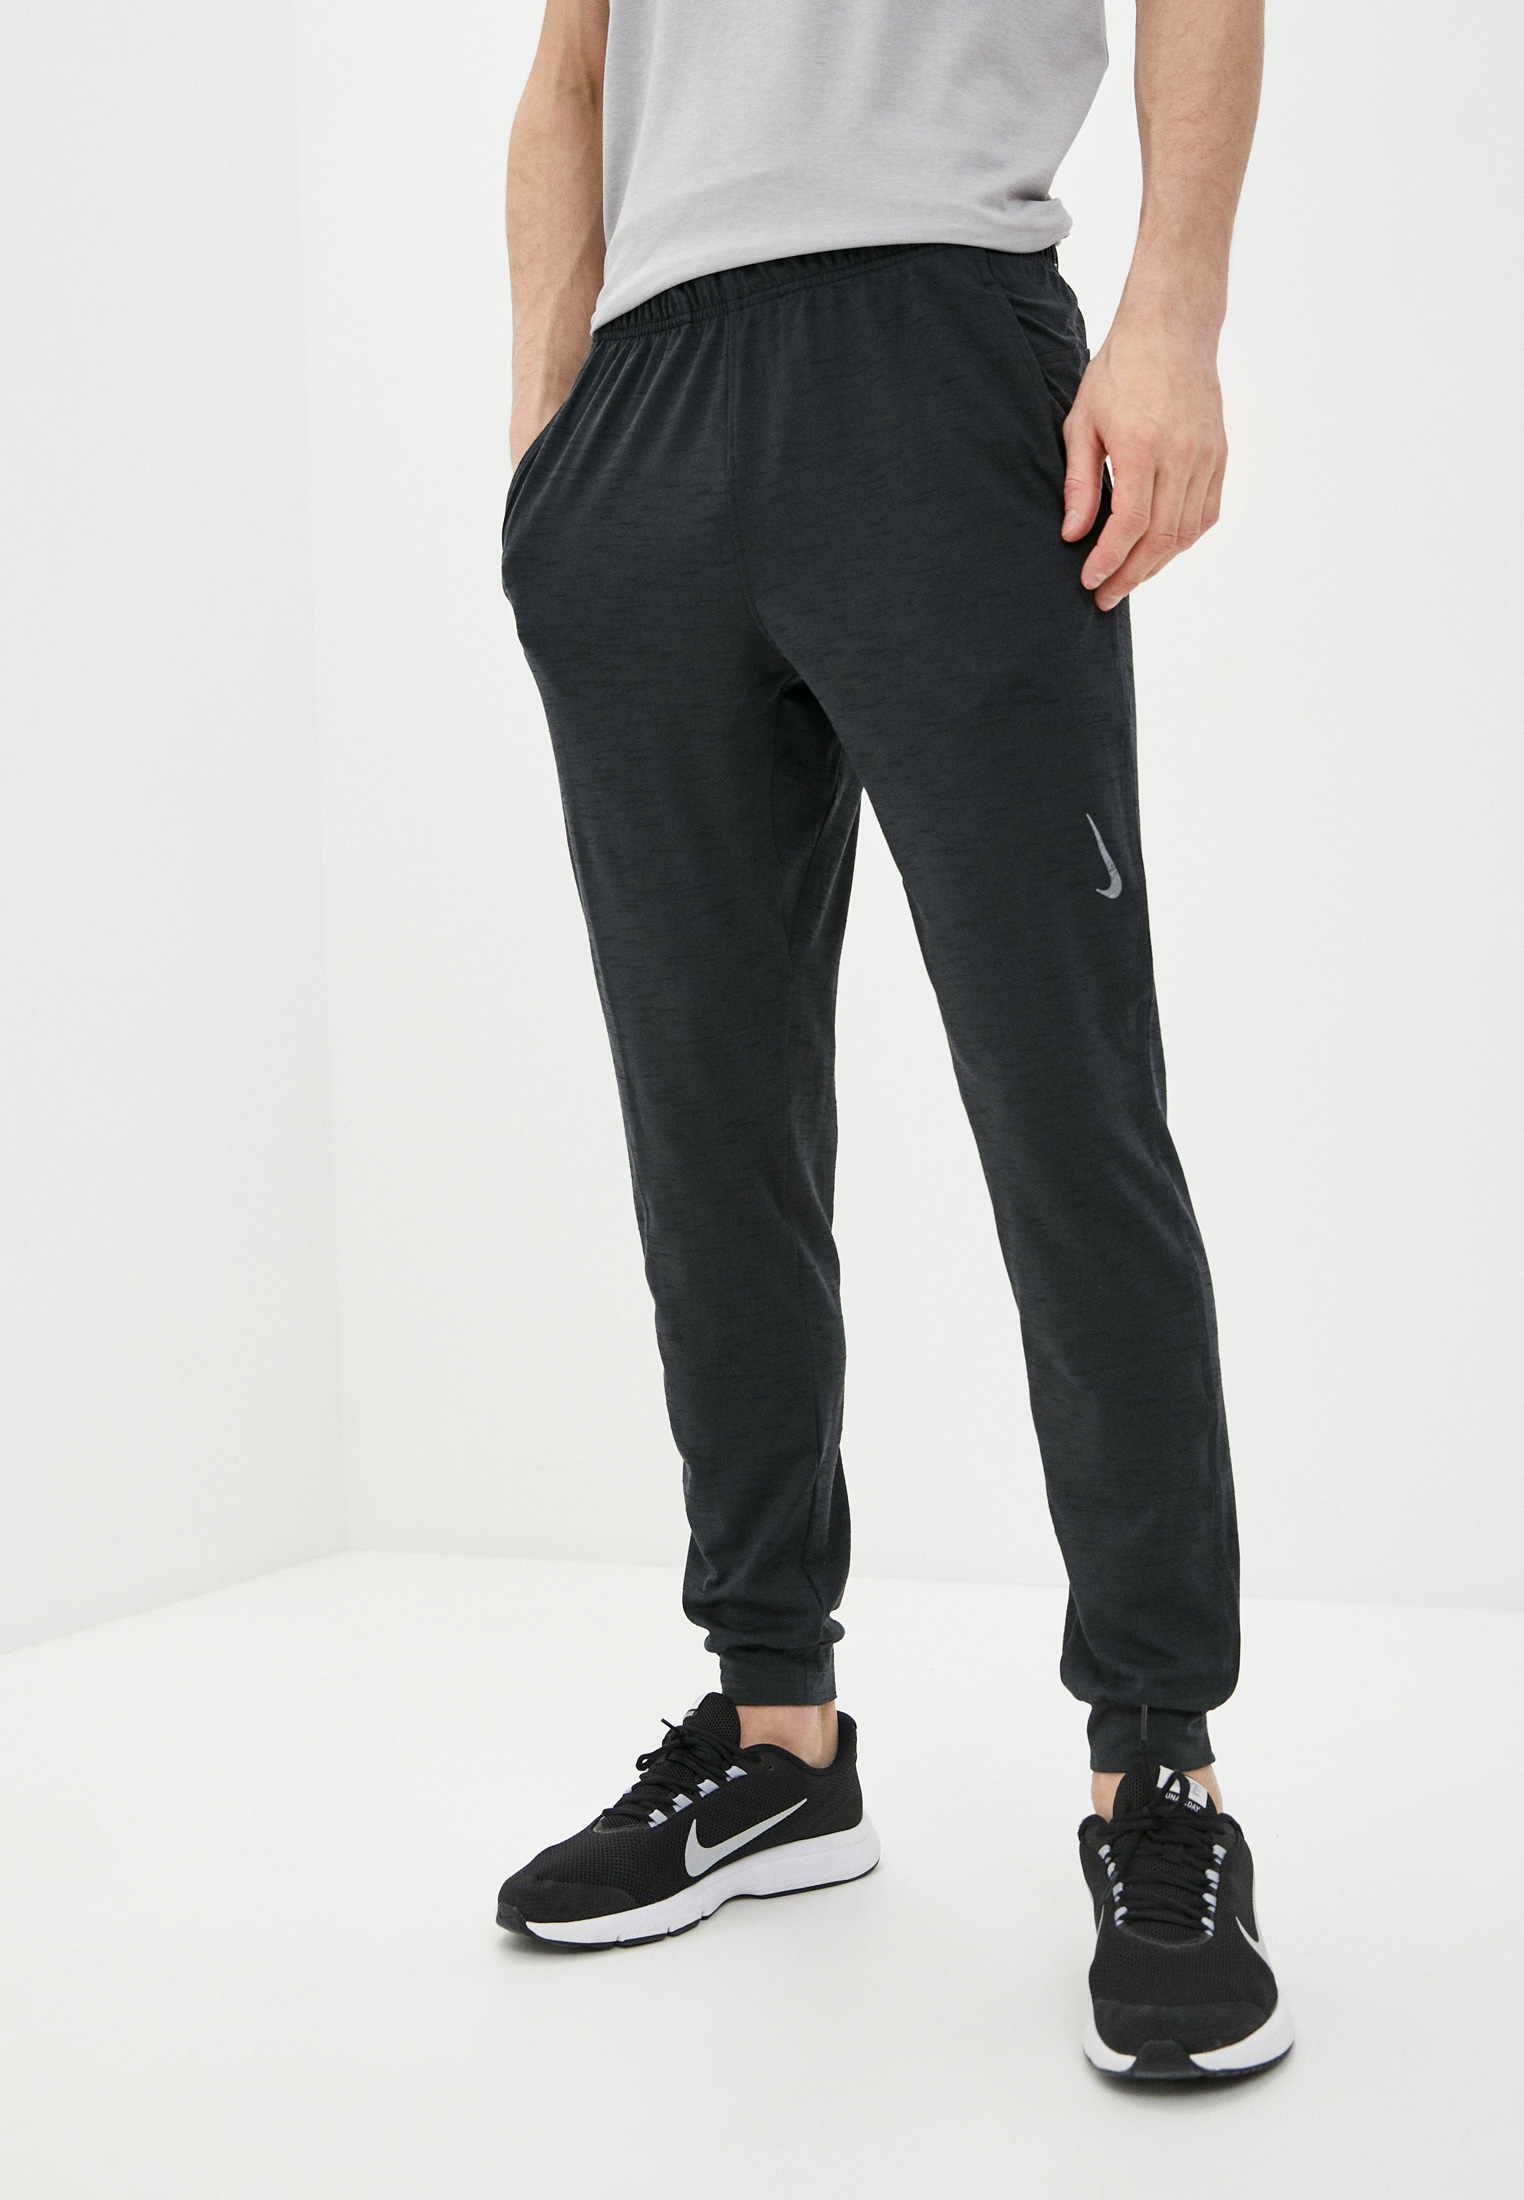 Мужские брюки Nike (Найк) Брюки спортивные Nike